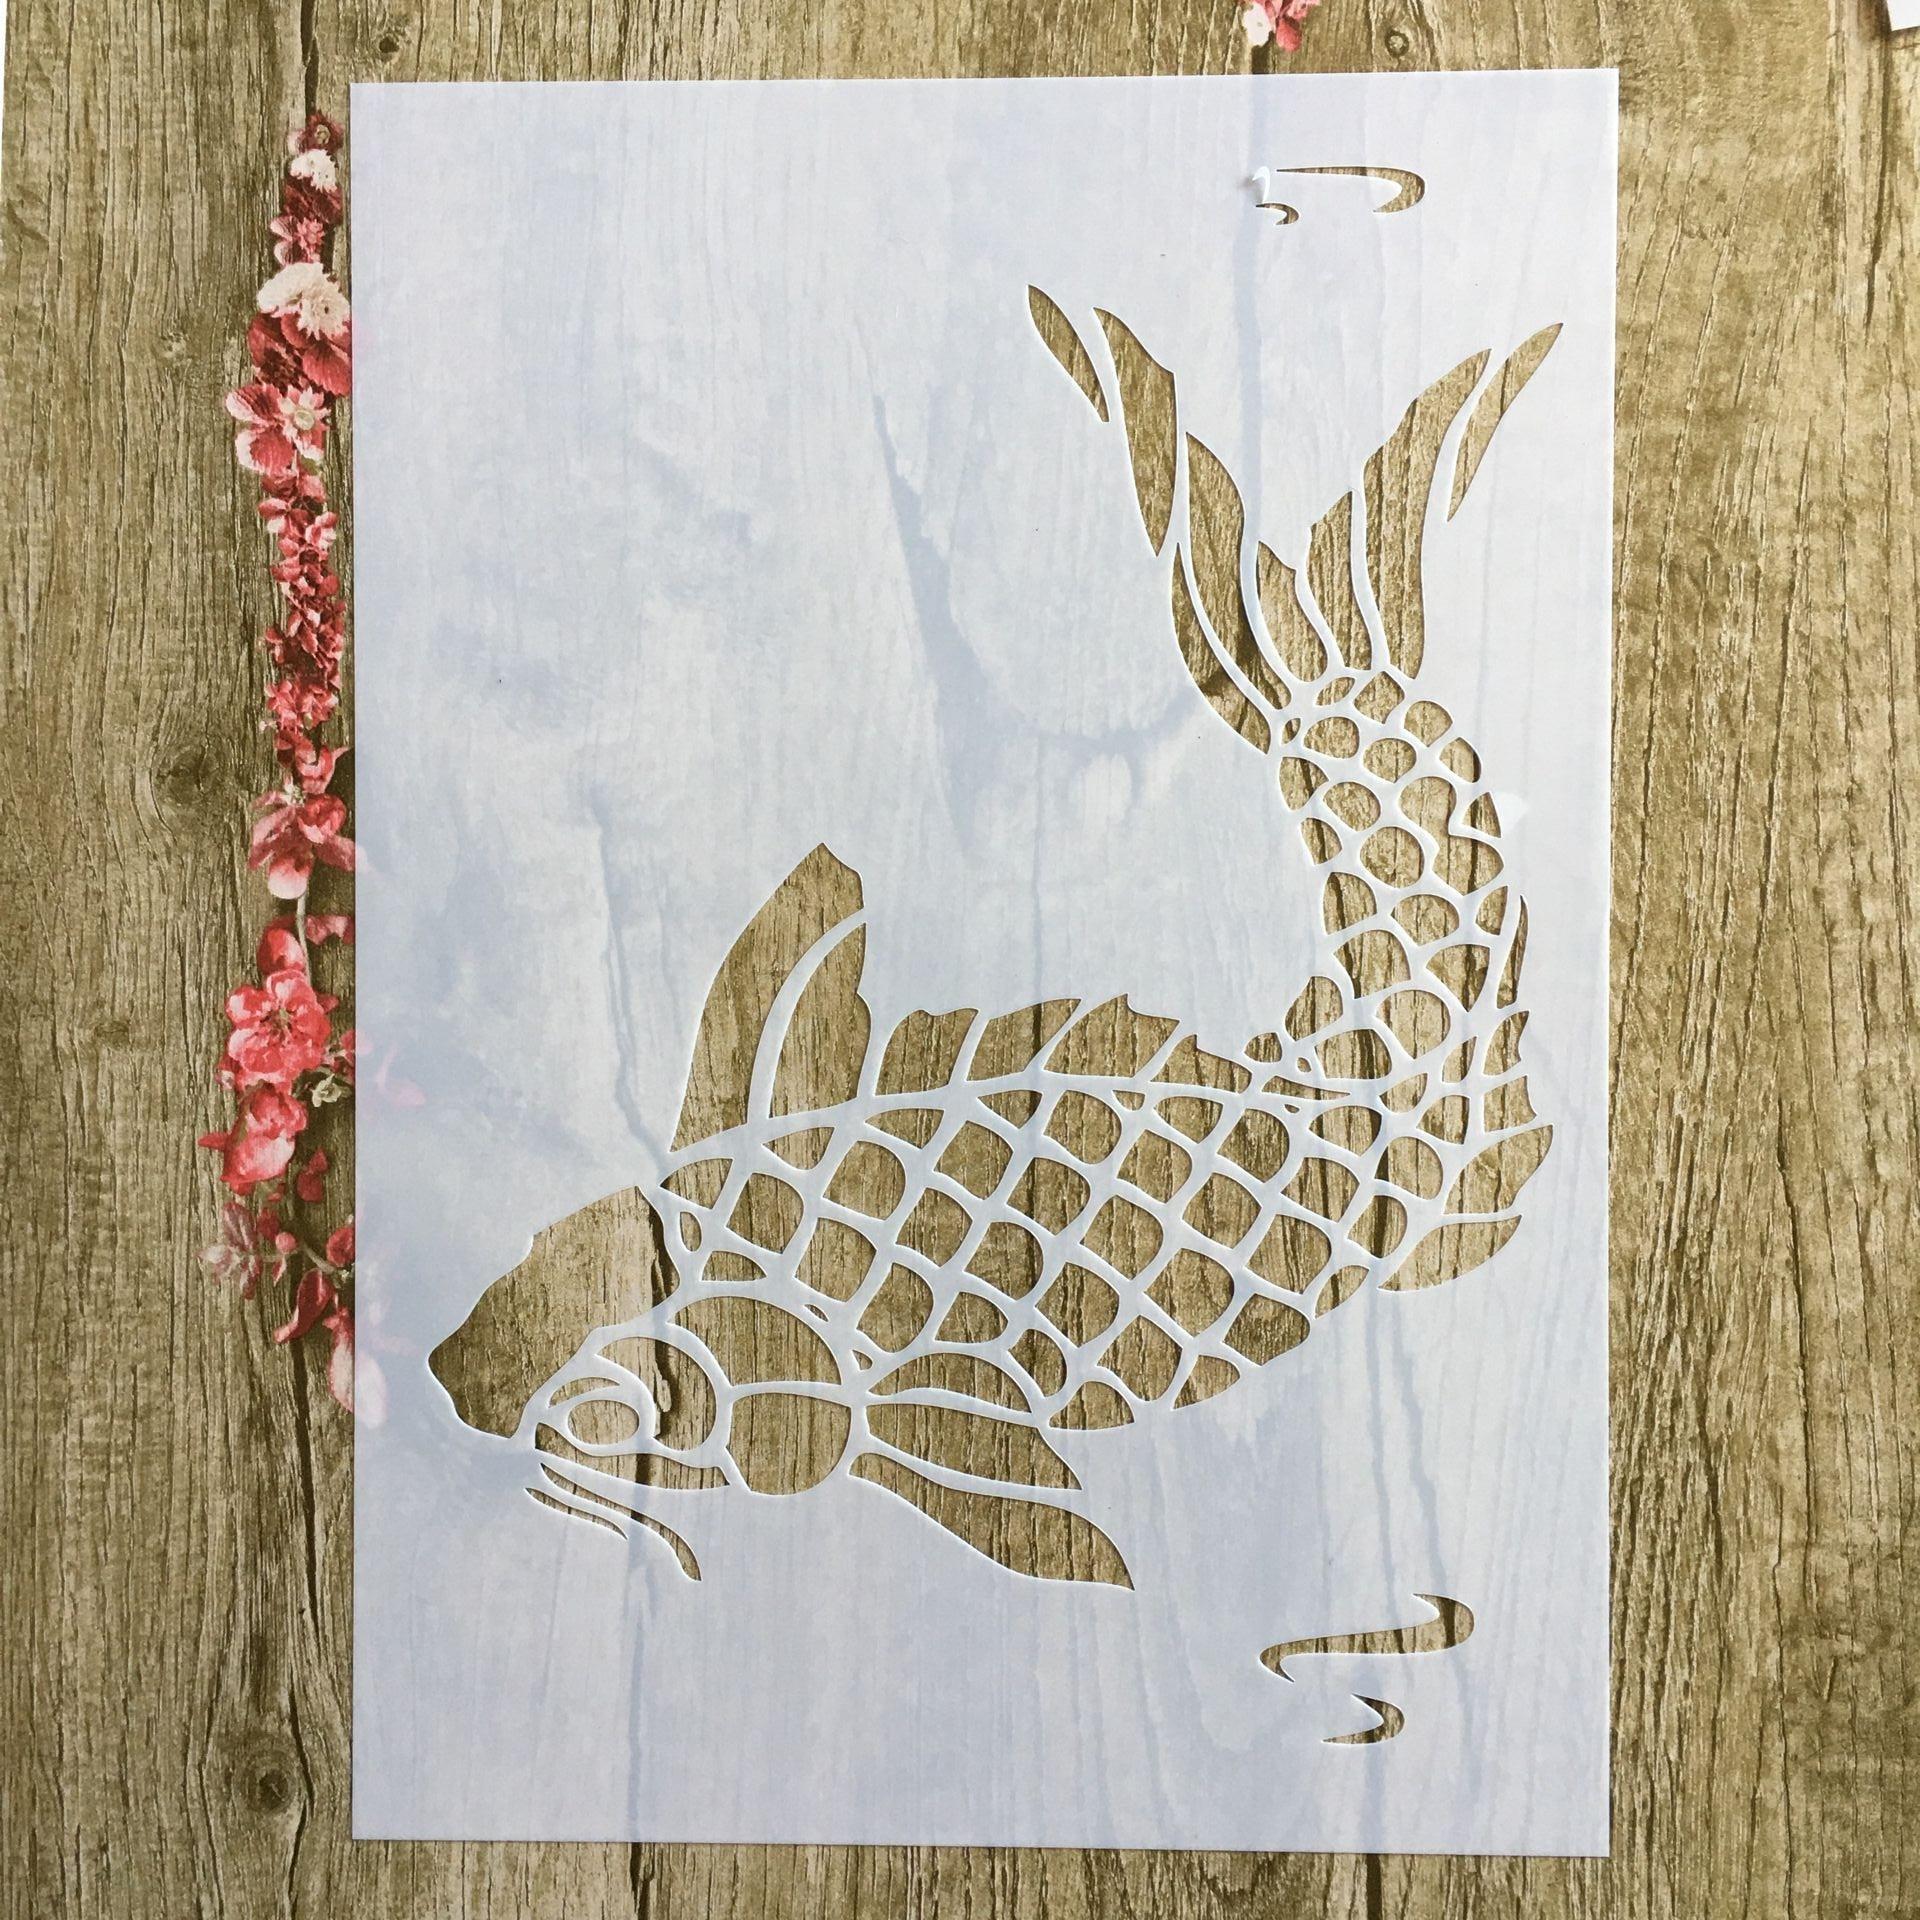 A4 29 * 21cm Animal Carp Fish DIY Stencils Wall Painting Scrapbook Coloring Embossing Album Decorative Paper Card Template